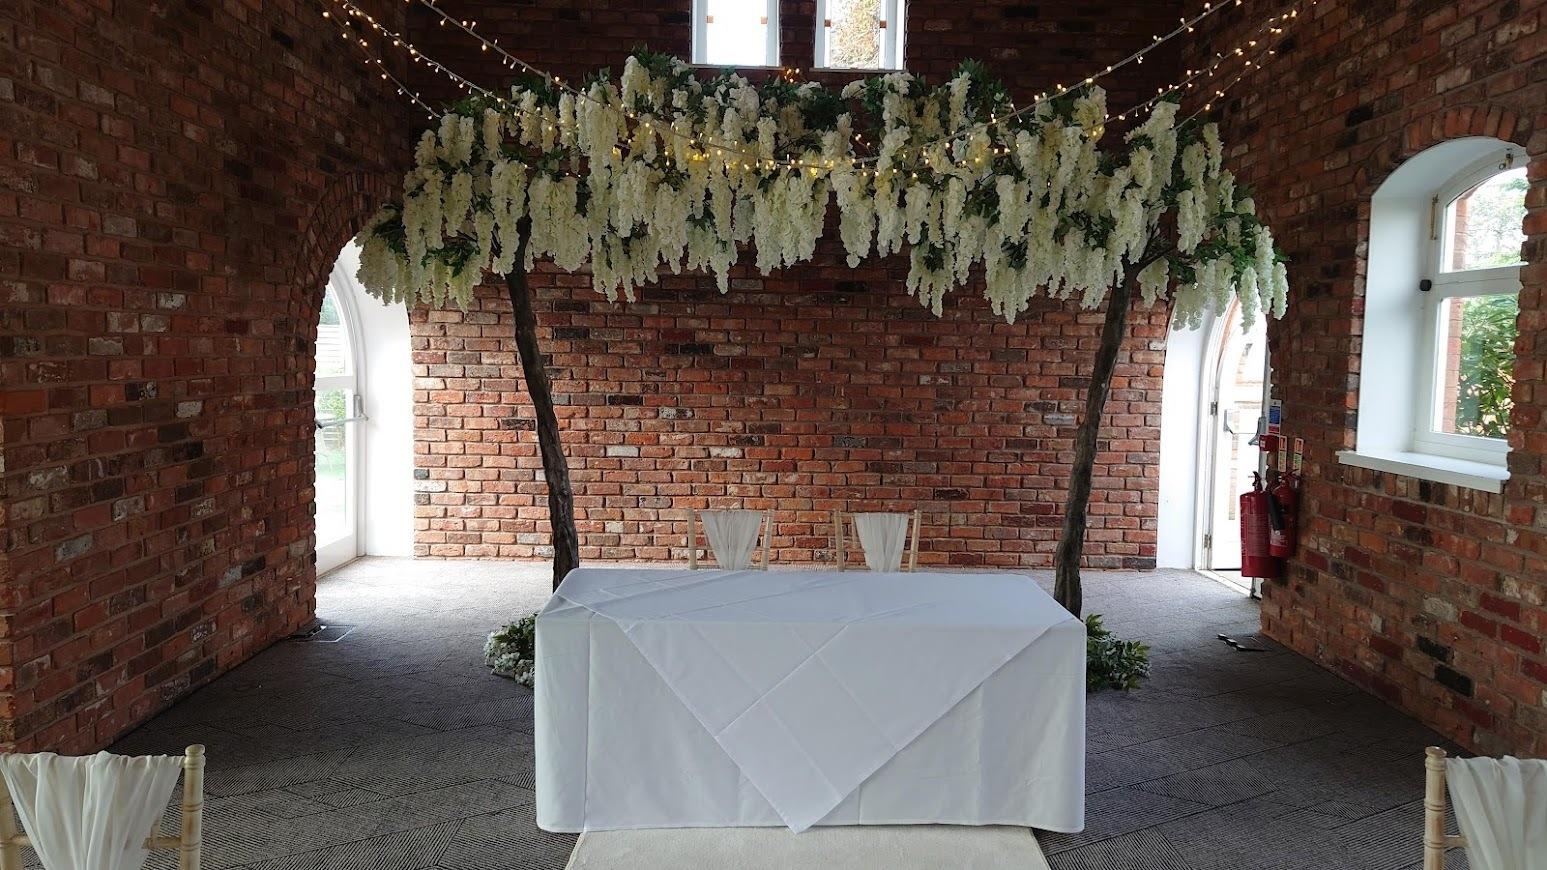 Canopy-wisteria-trees-Doubletree-Hilton